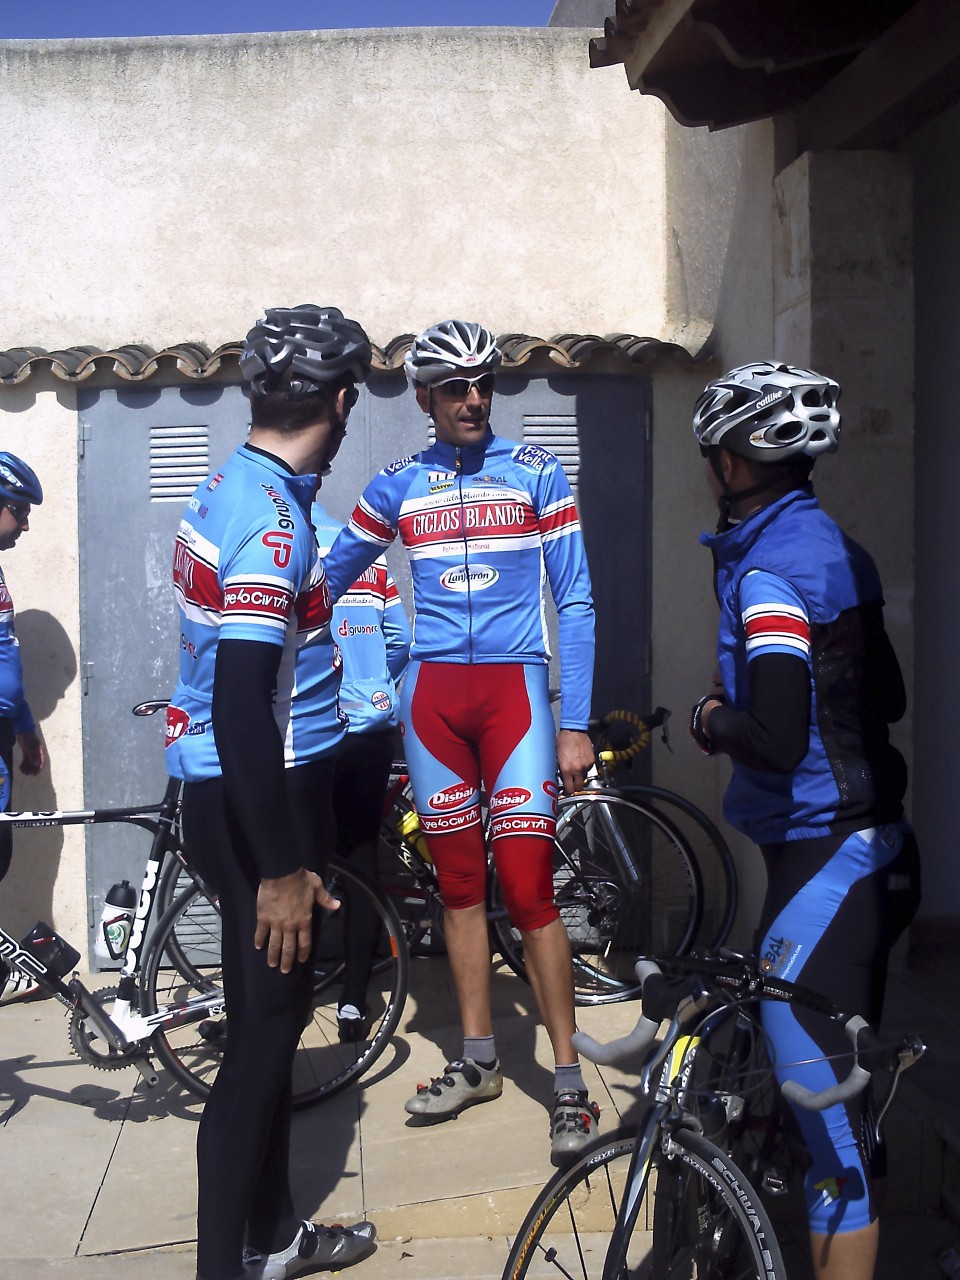 21-03-2009-palankas-team-competicion043-50